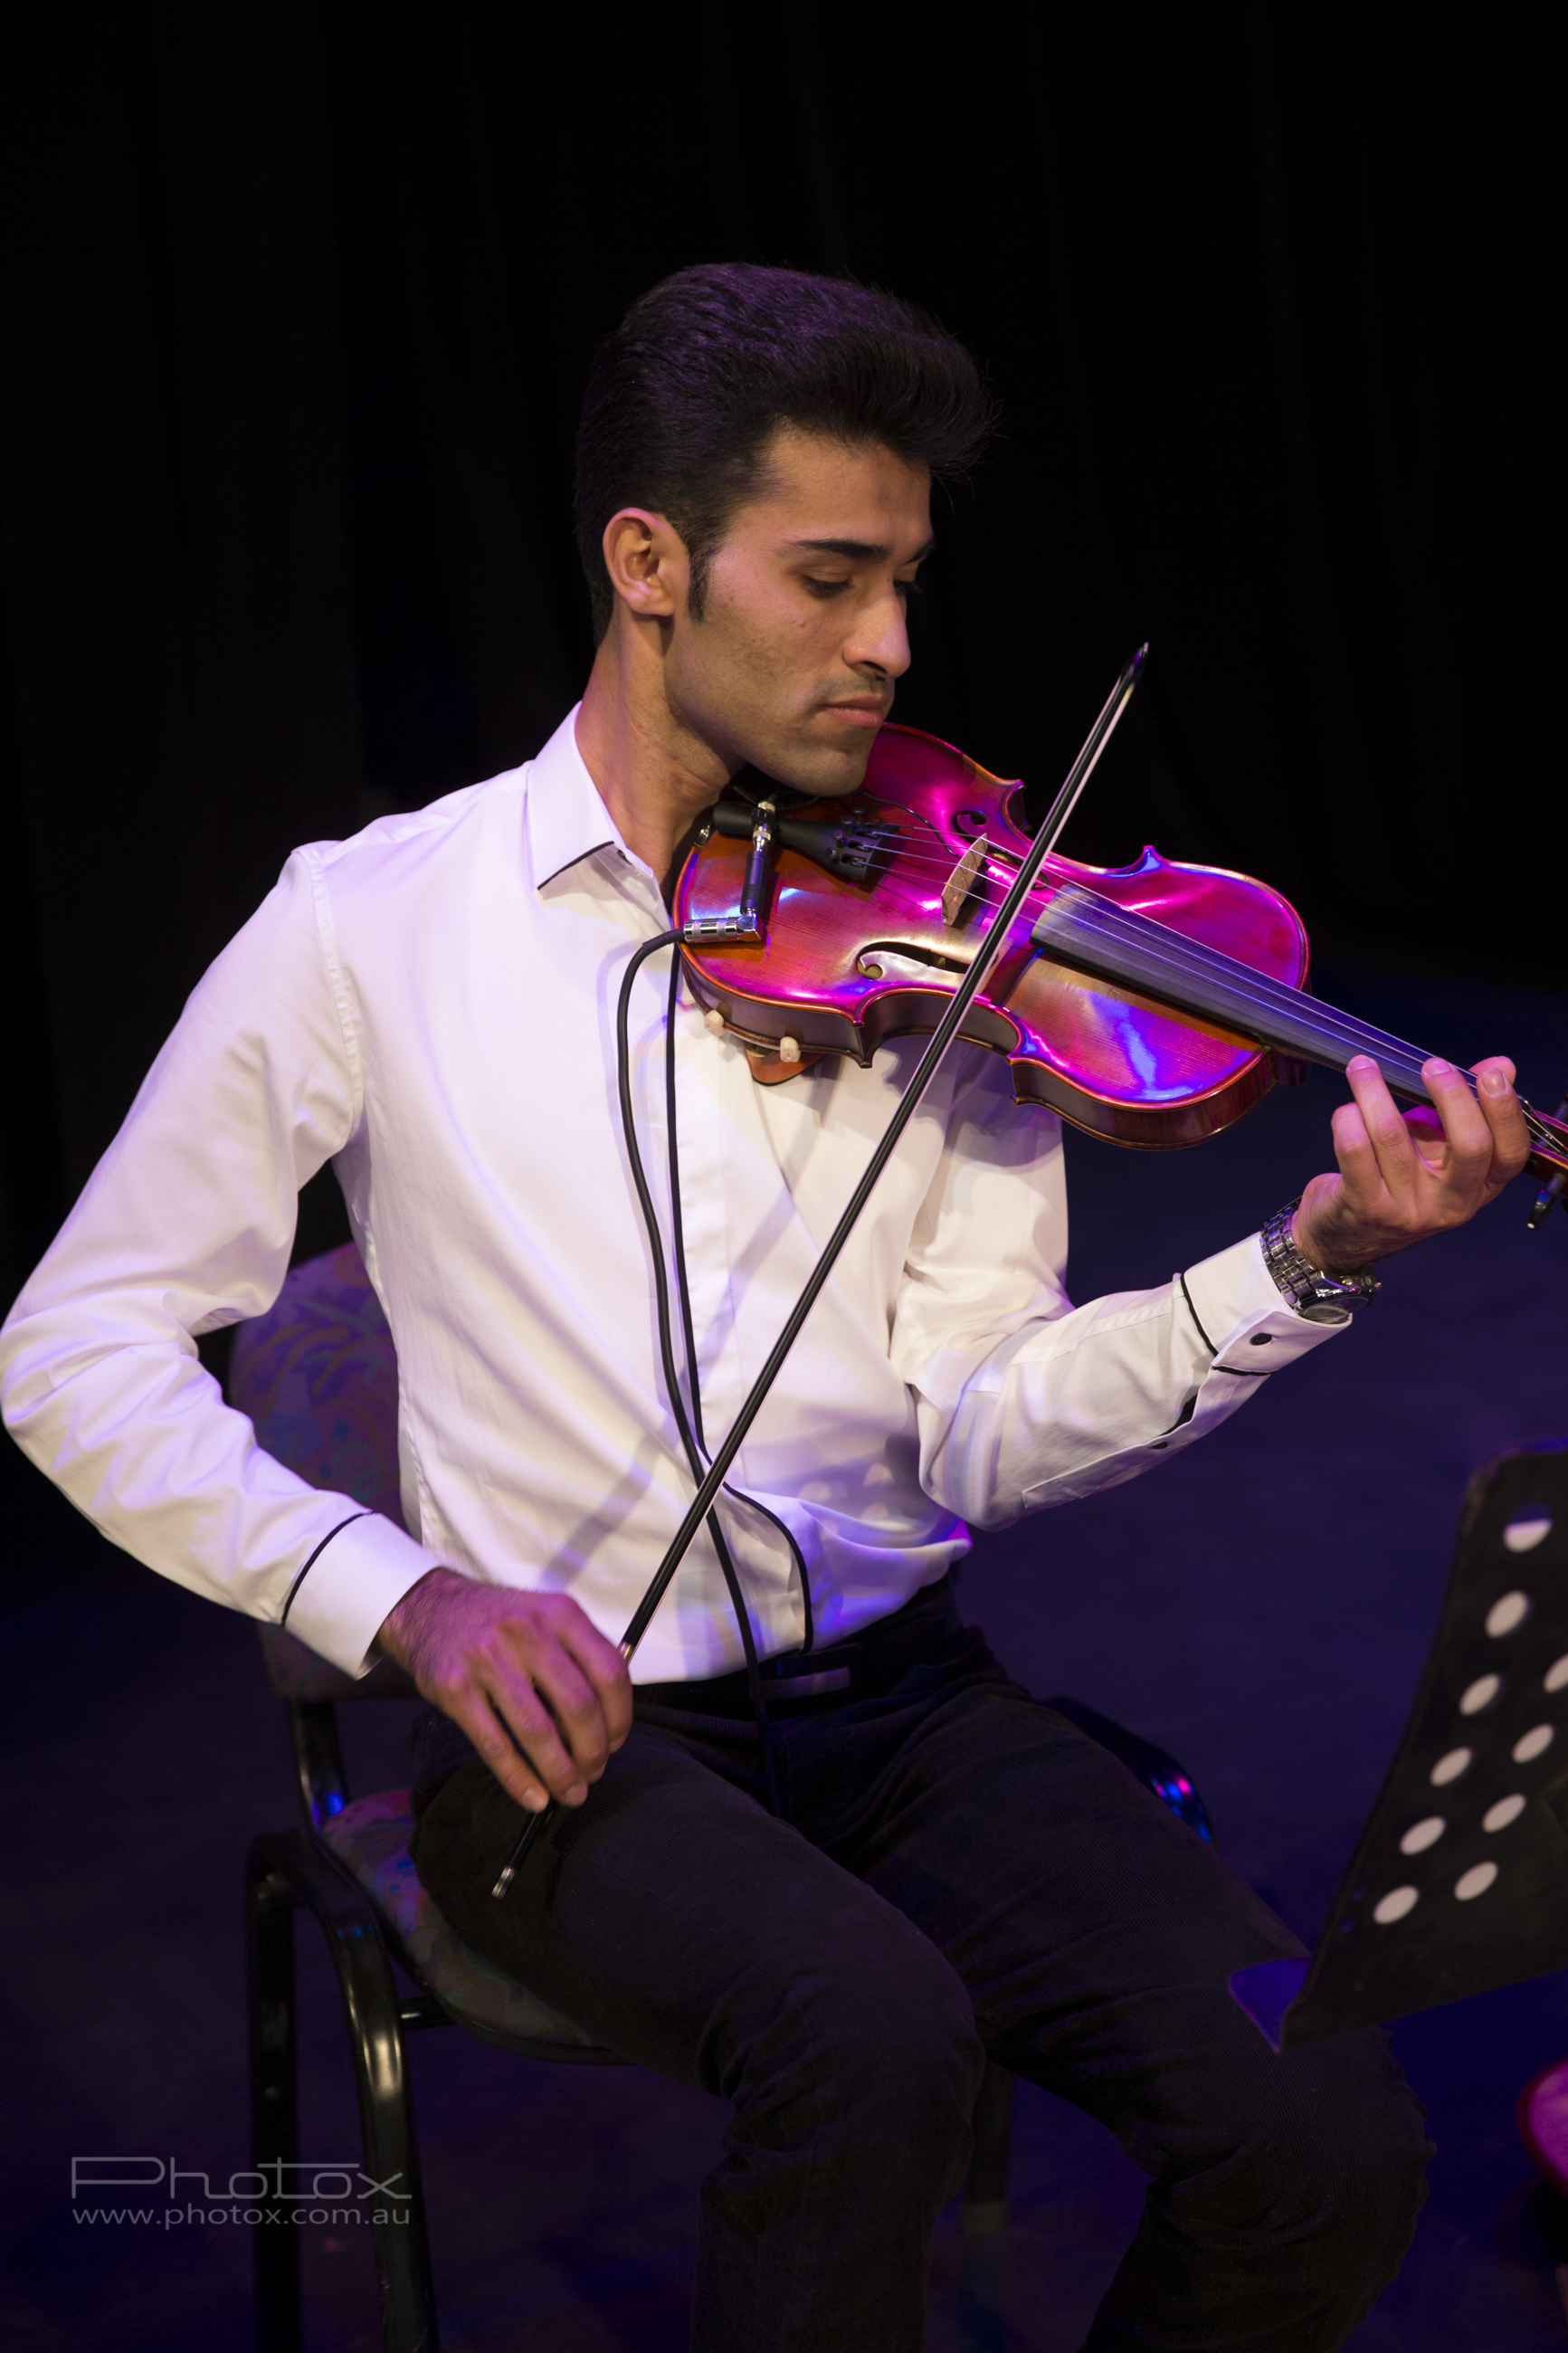 Sydney World Music Chamber Orchestra - Social Media (11 of 115).JPG